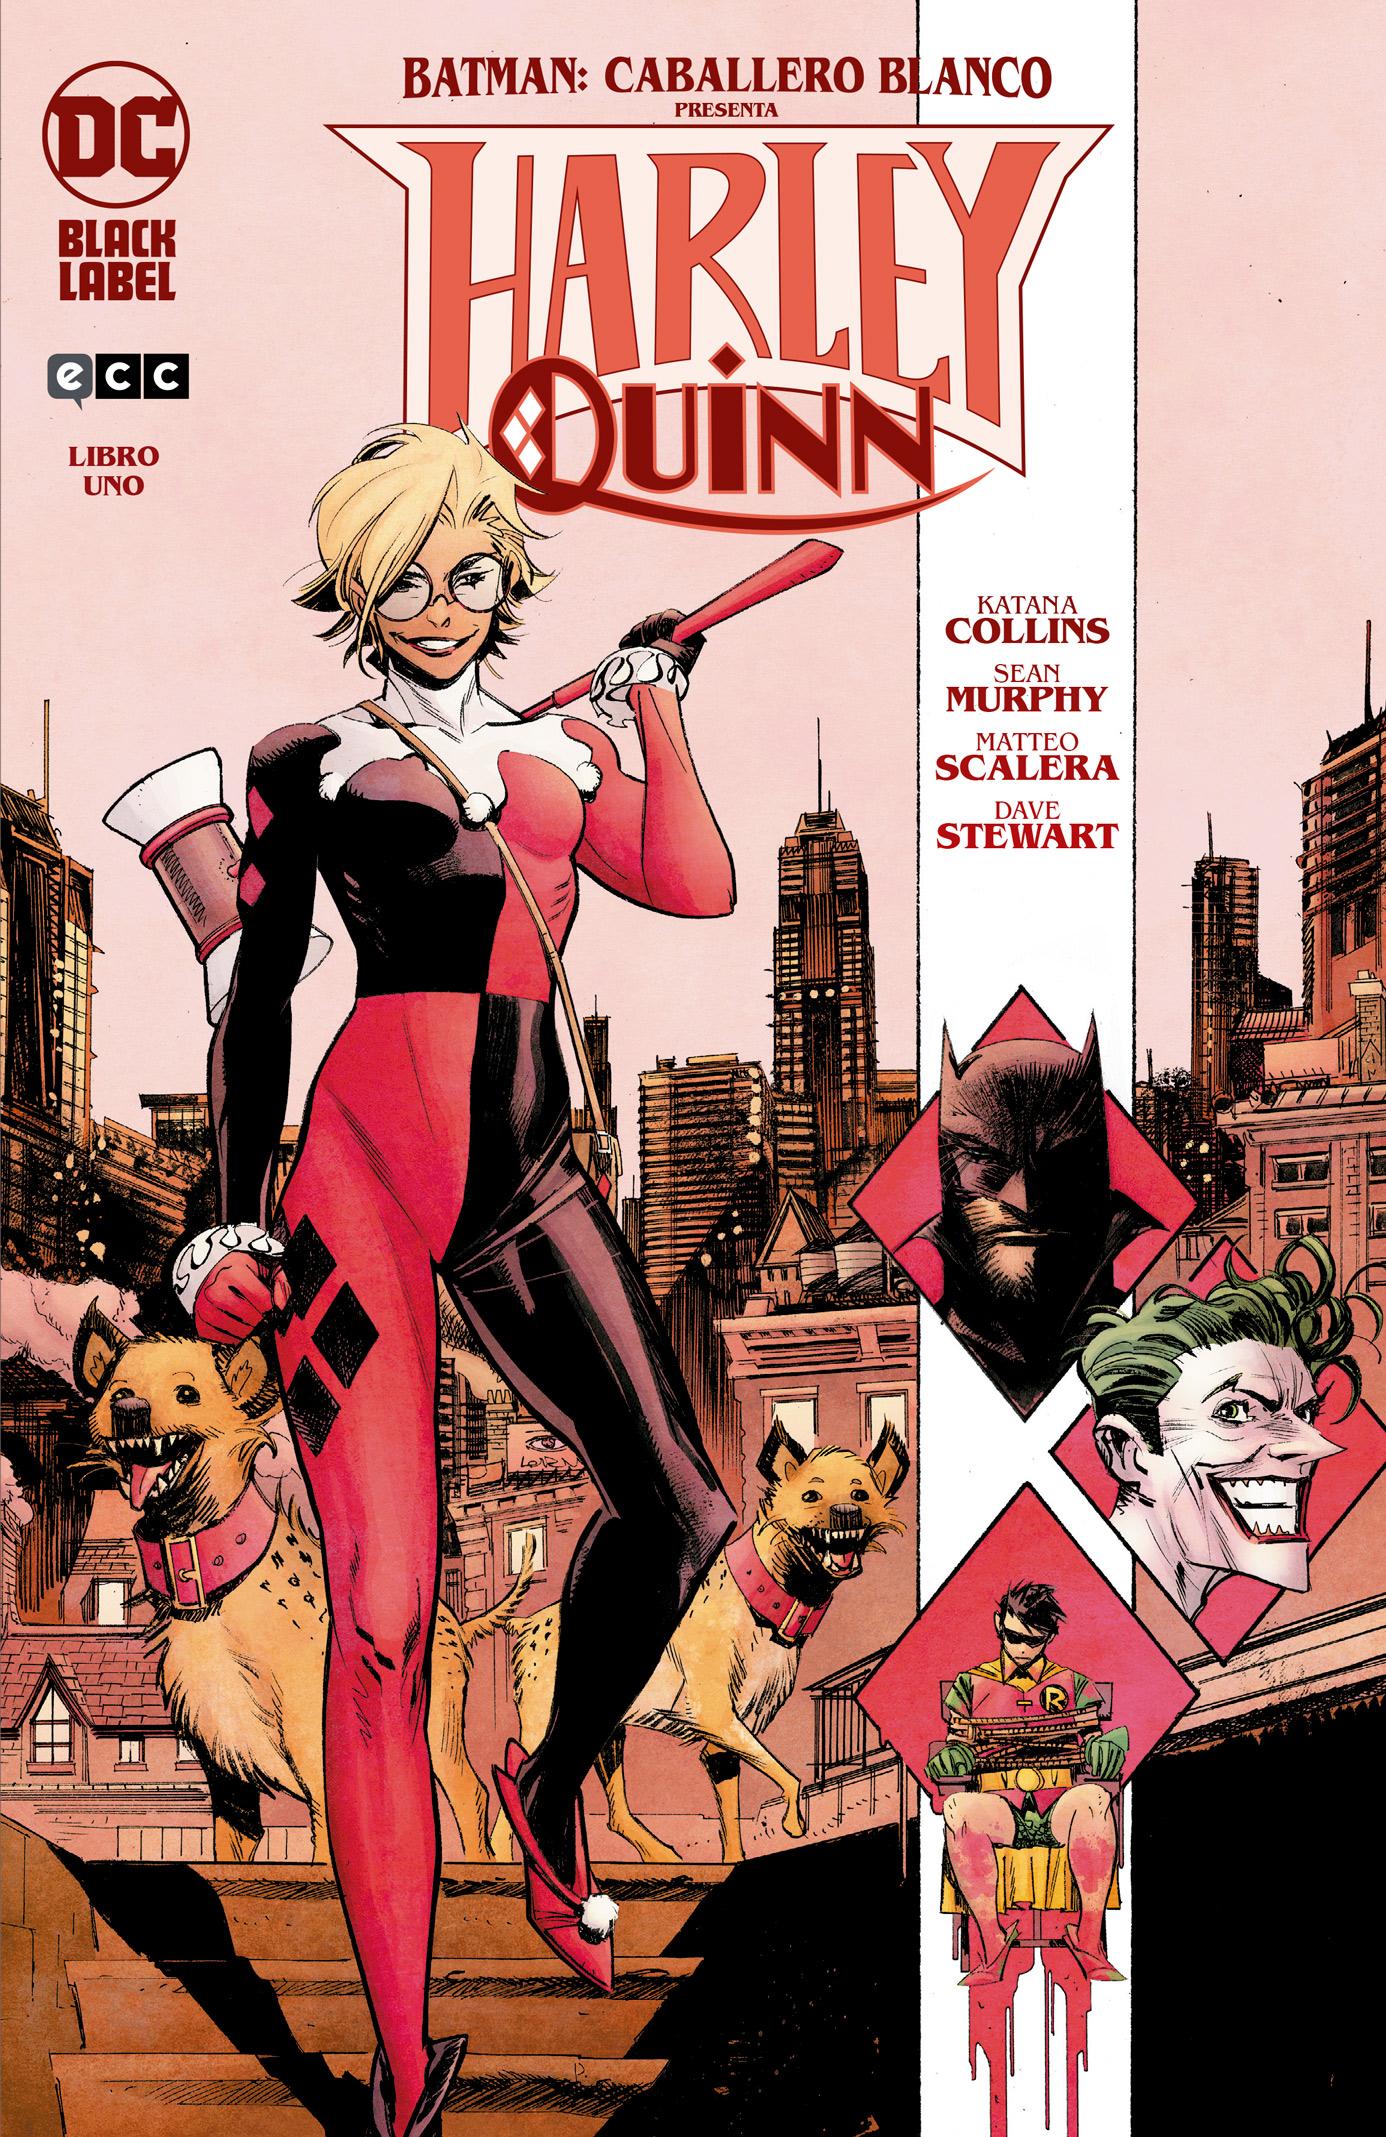 Batman: Caballero Blanco - Harley Quinn #1 de 6